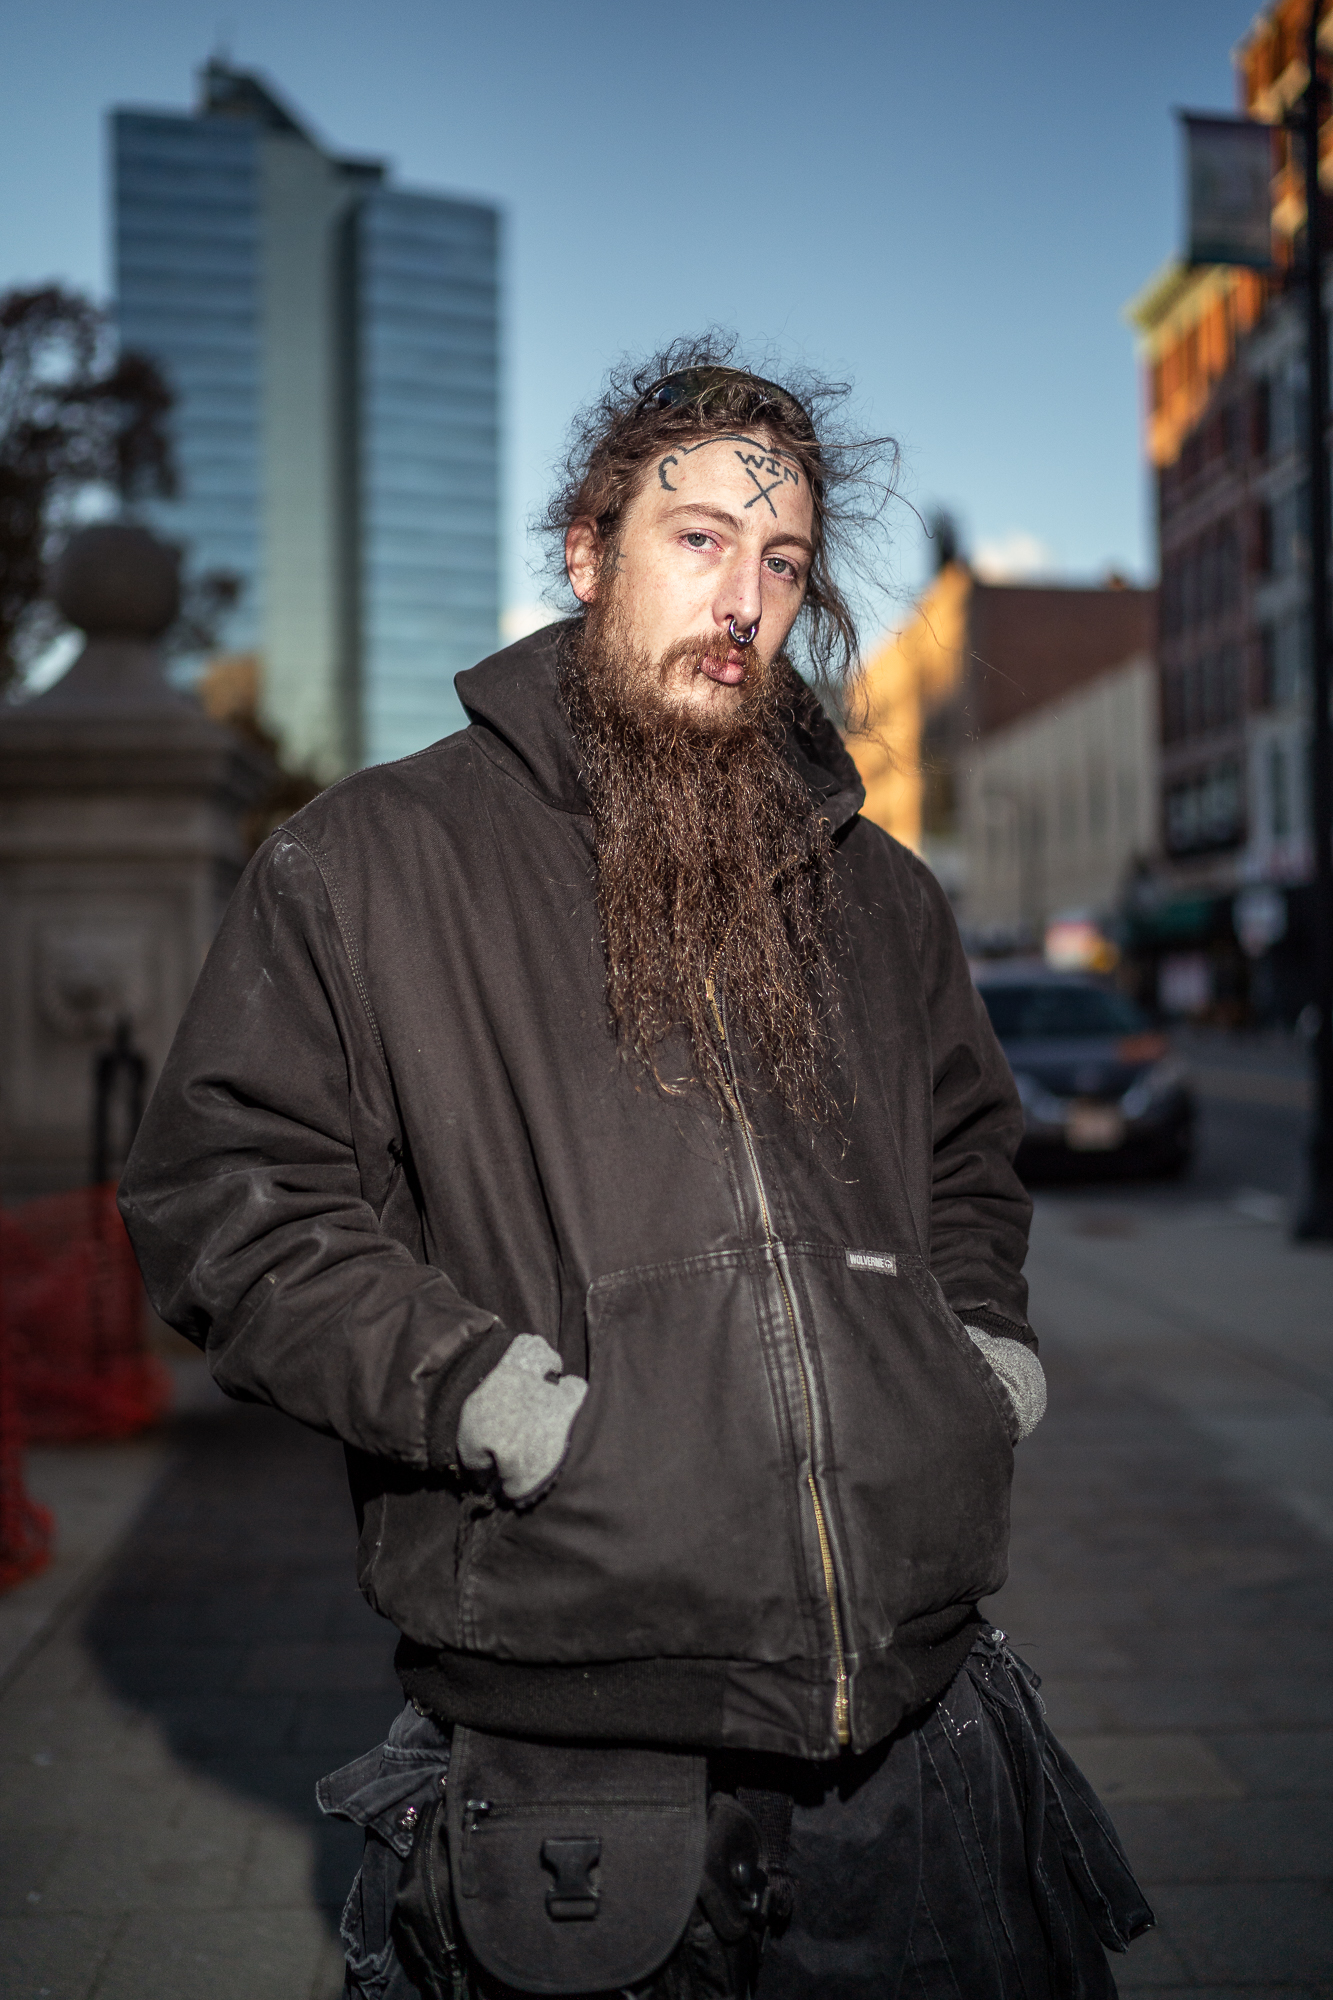 Brian, Front Street, November, 2018.